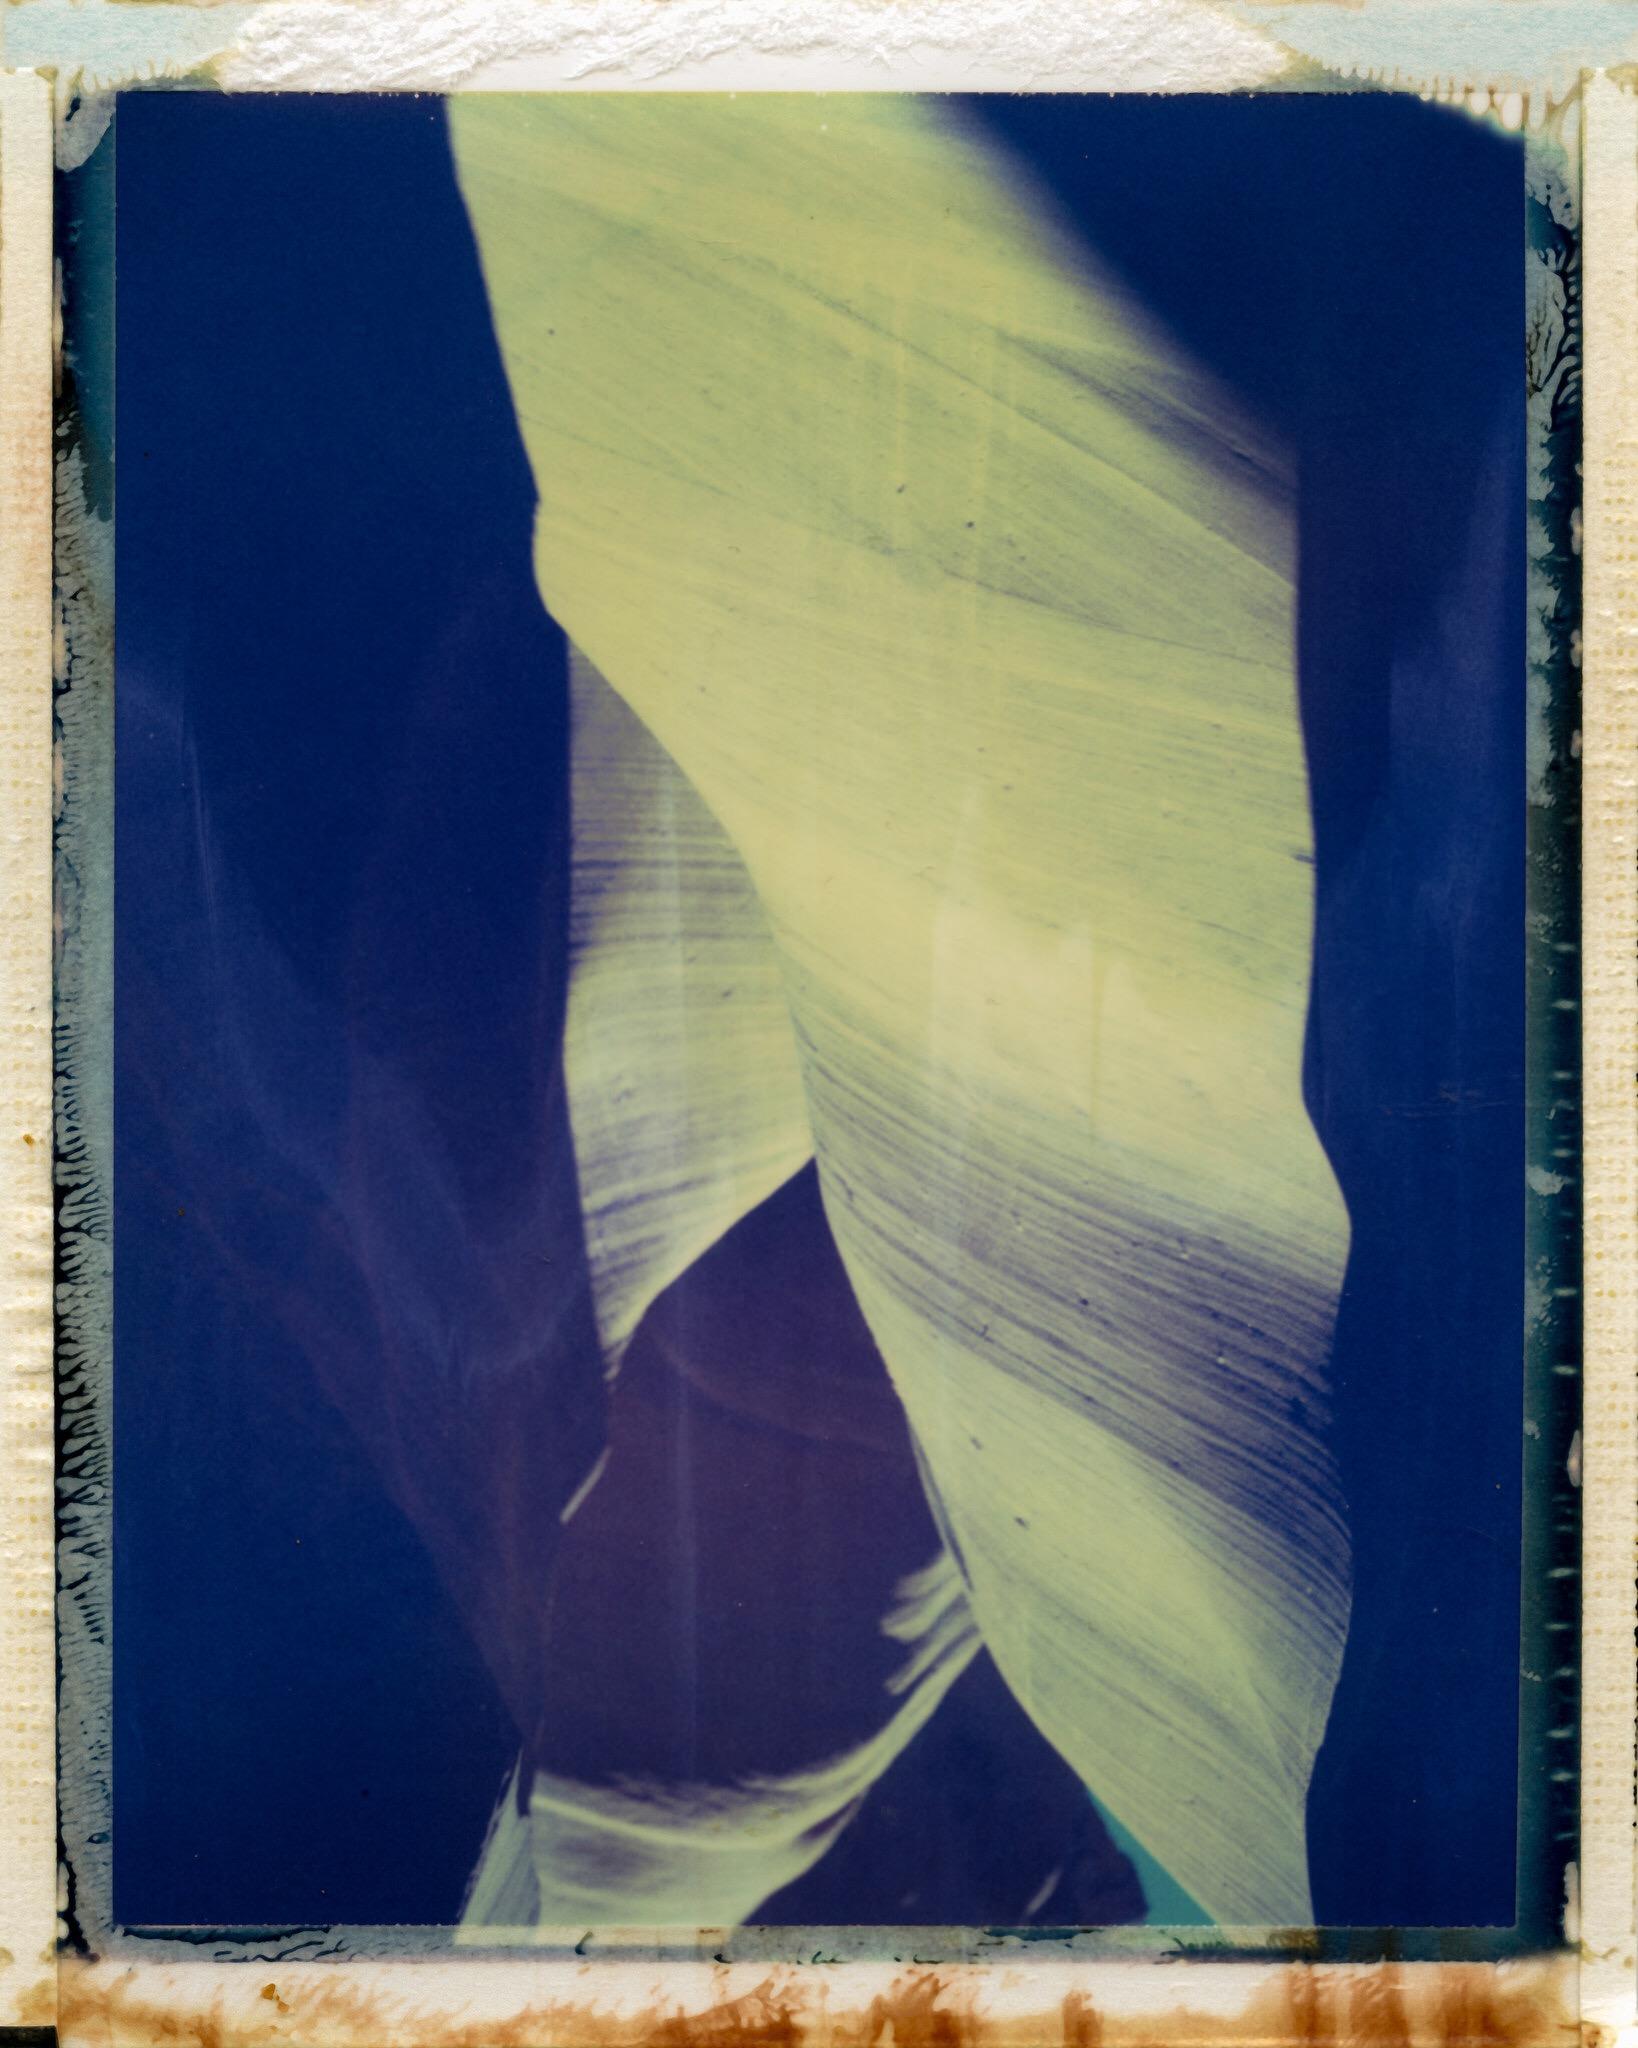 Antelope Canyon | Polaroid Land Camera 180 | Polaroid IDUV FIlm | Peter McCabe